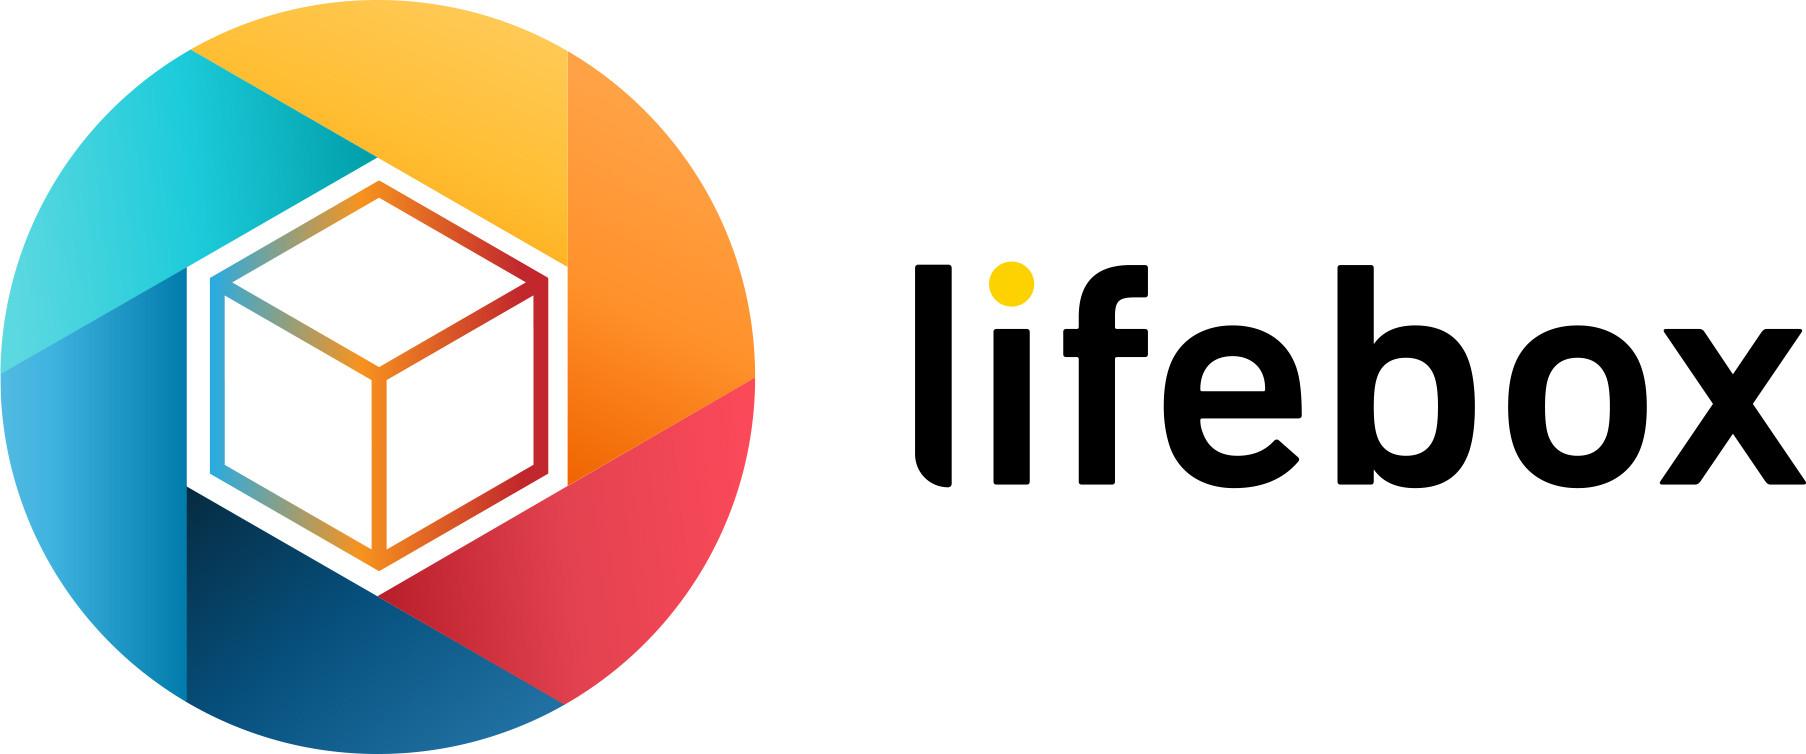 1478511389_lifebox-logo.jpg